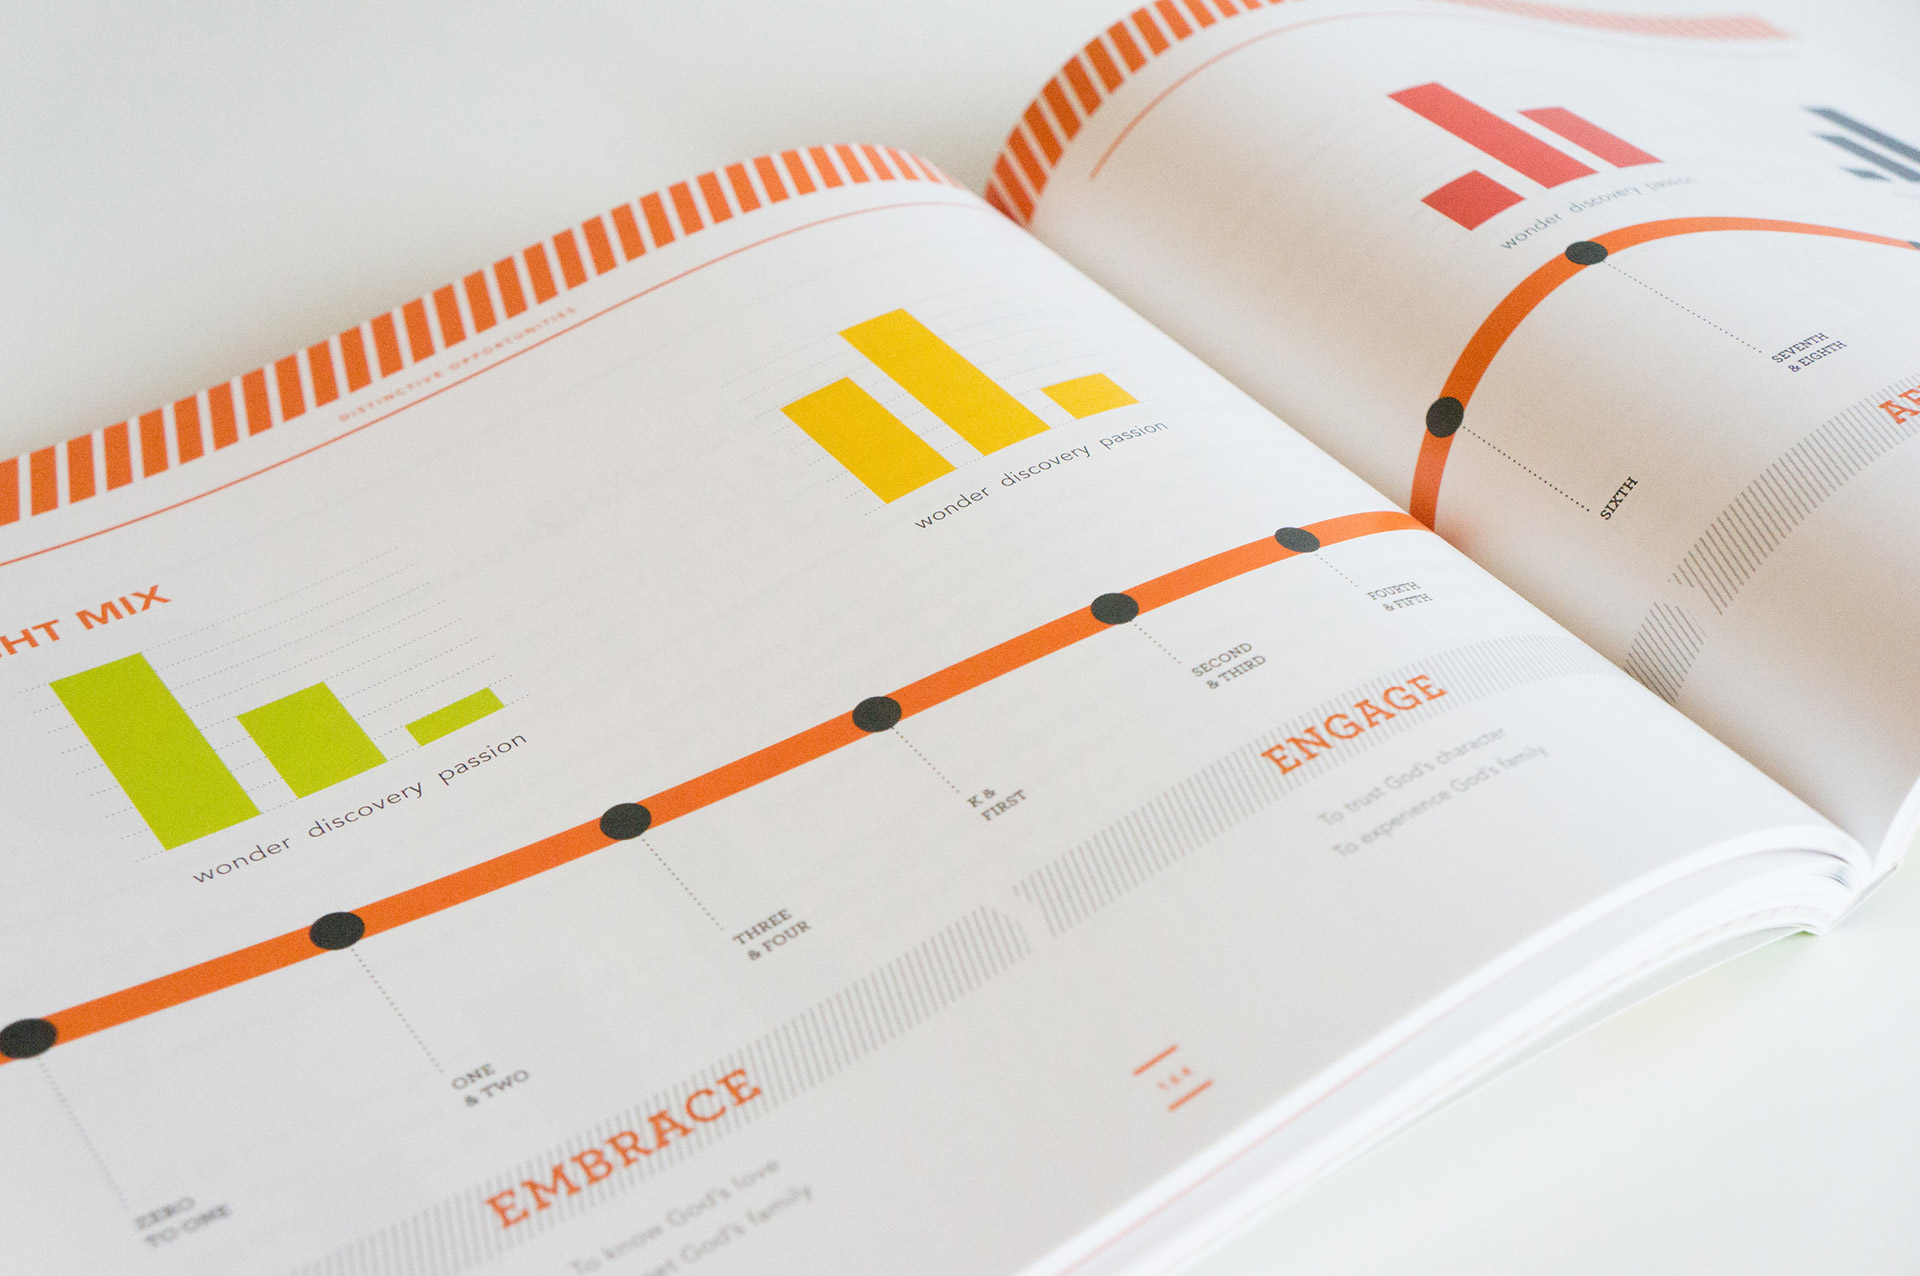 orangeconference-2015-phasebook-03.jpg